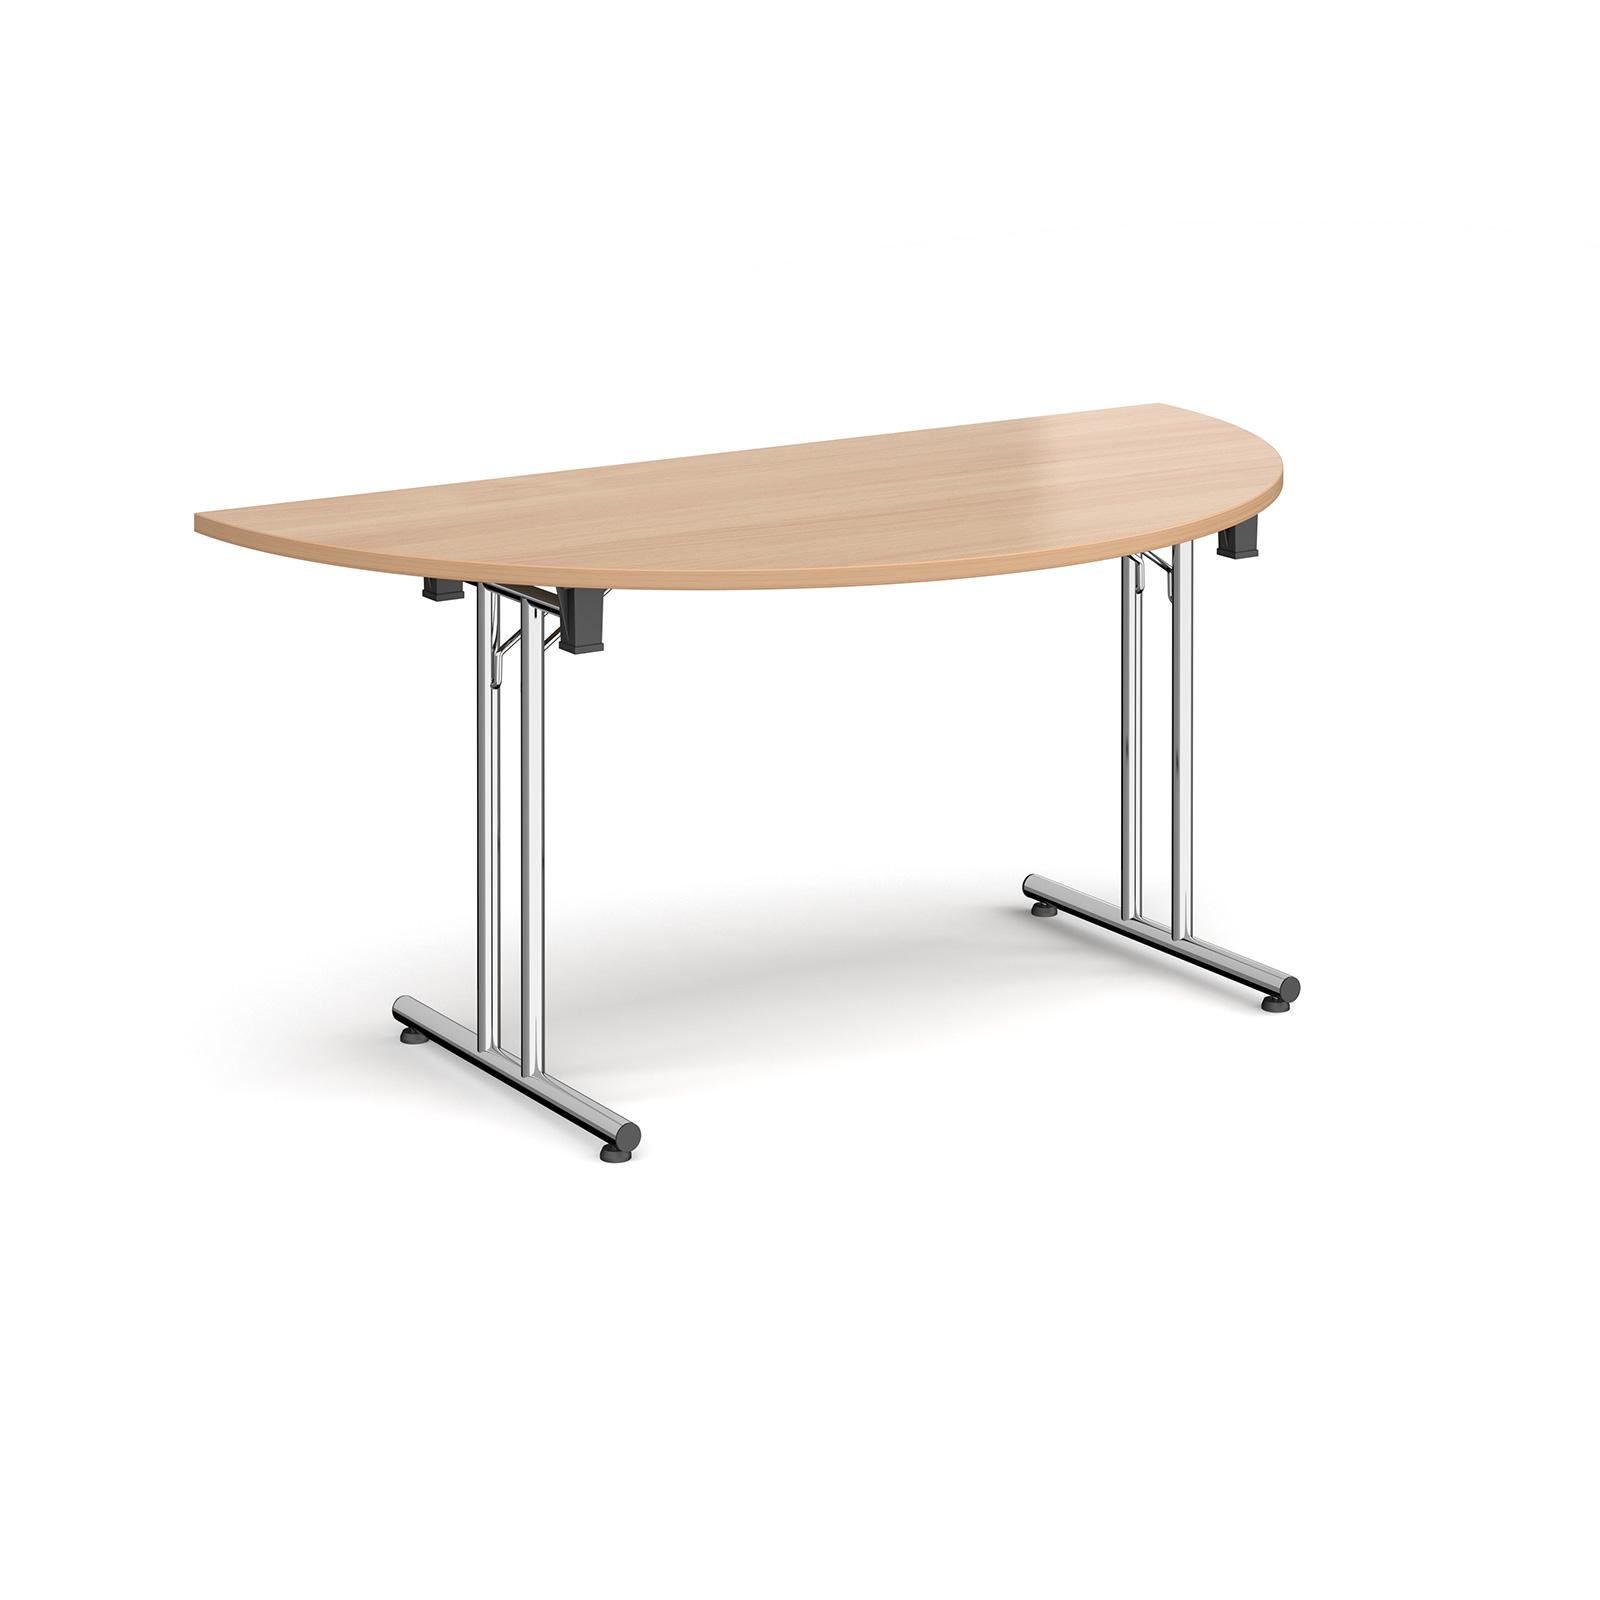 Boardroom / Meeting Semi circular folding leg table with straight feet